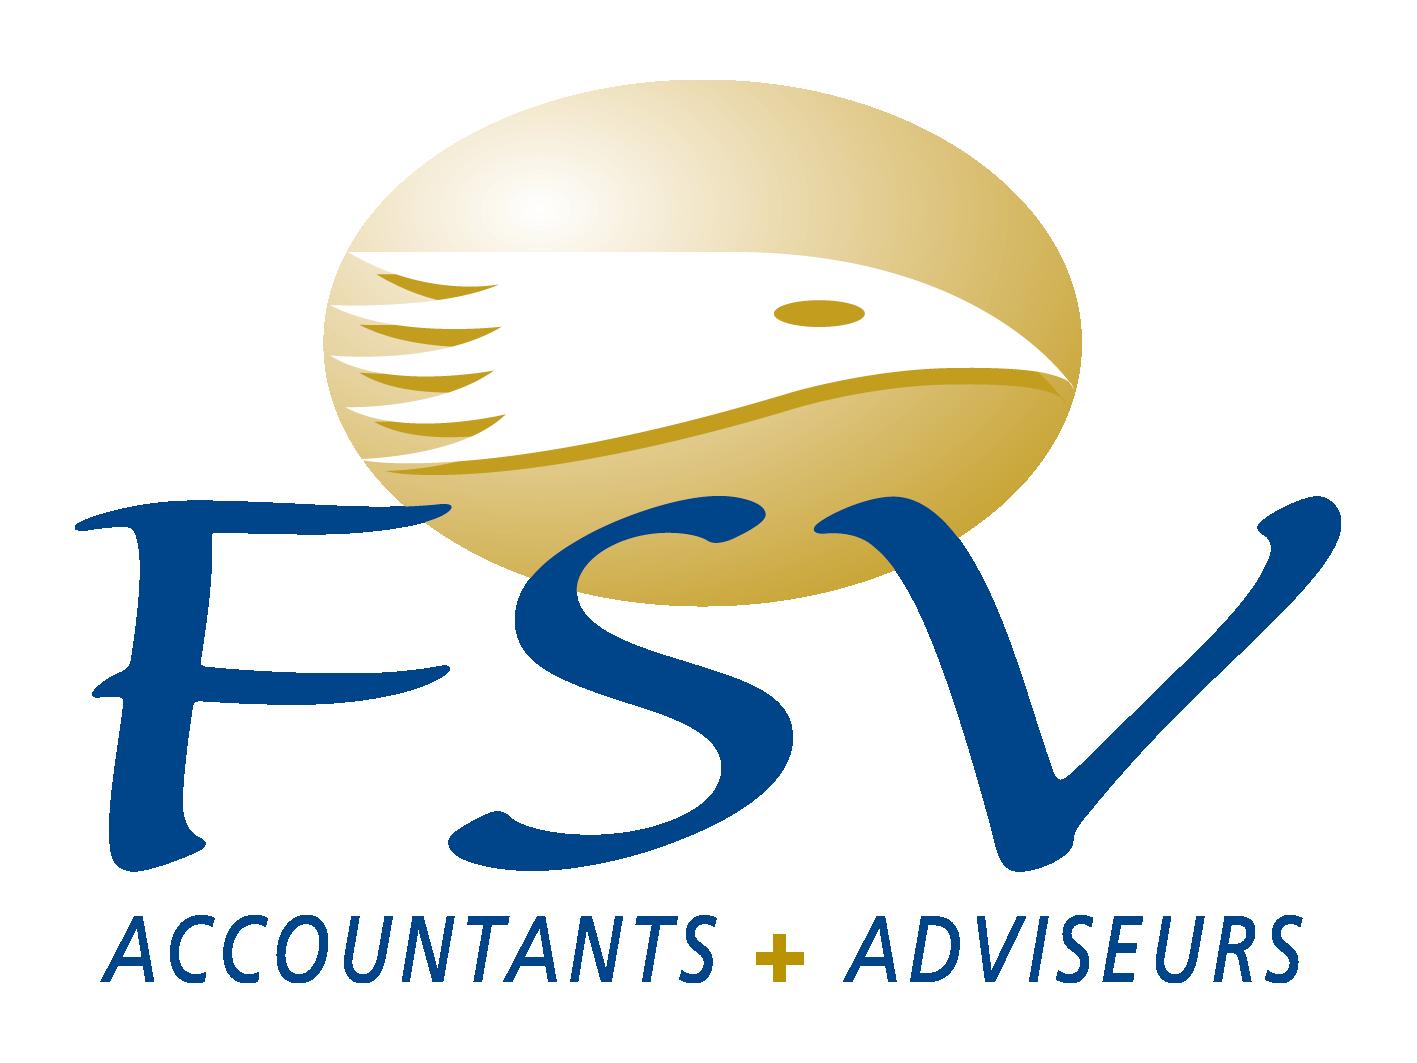 FSV Accountants & Adviseurs